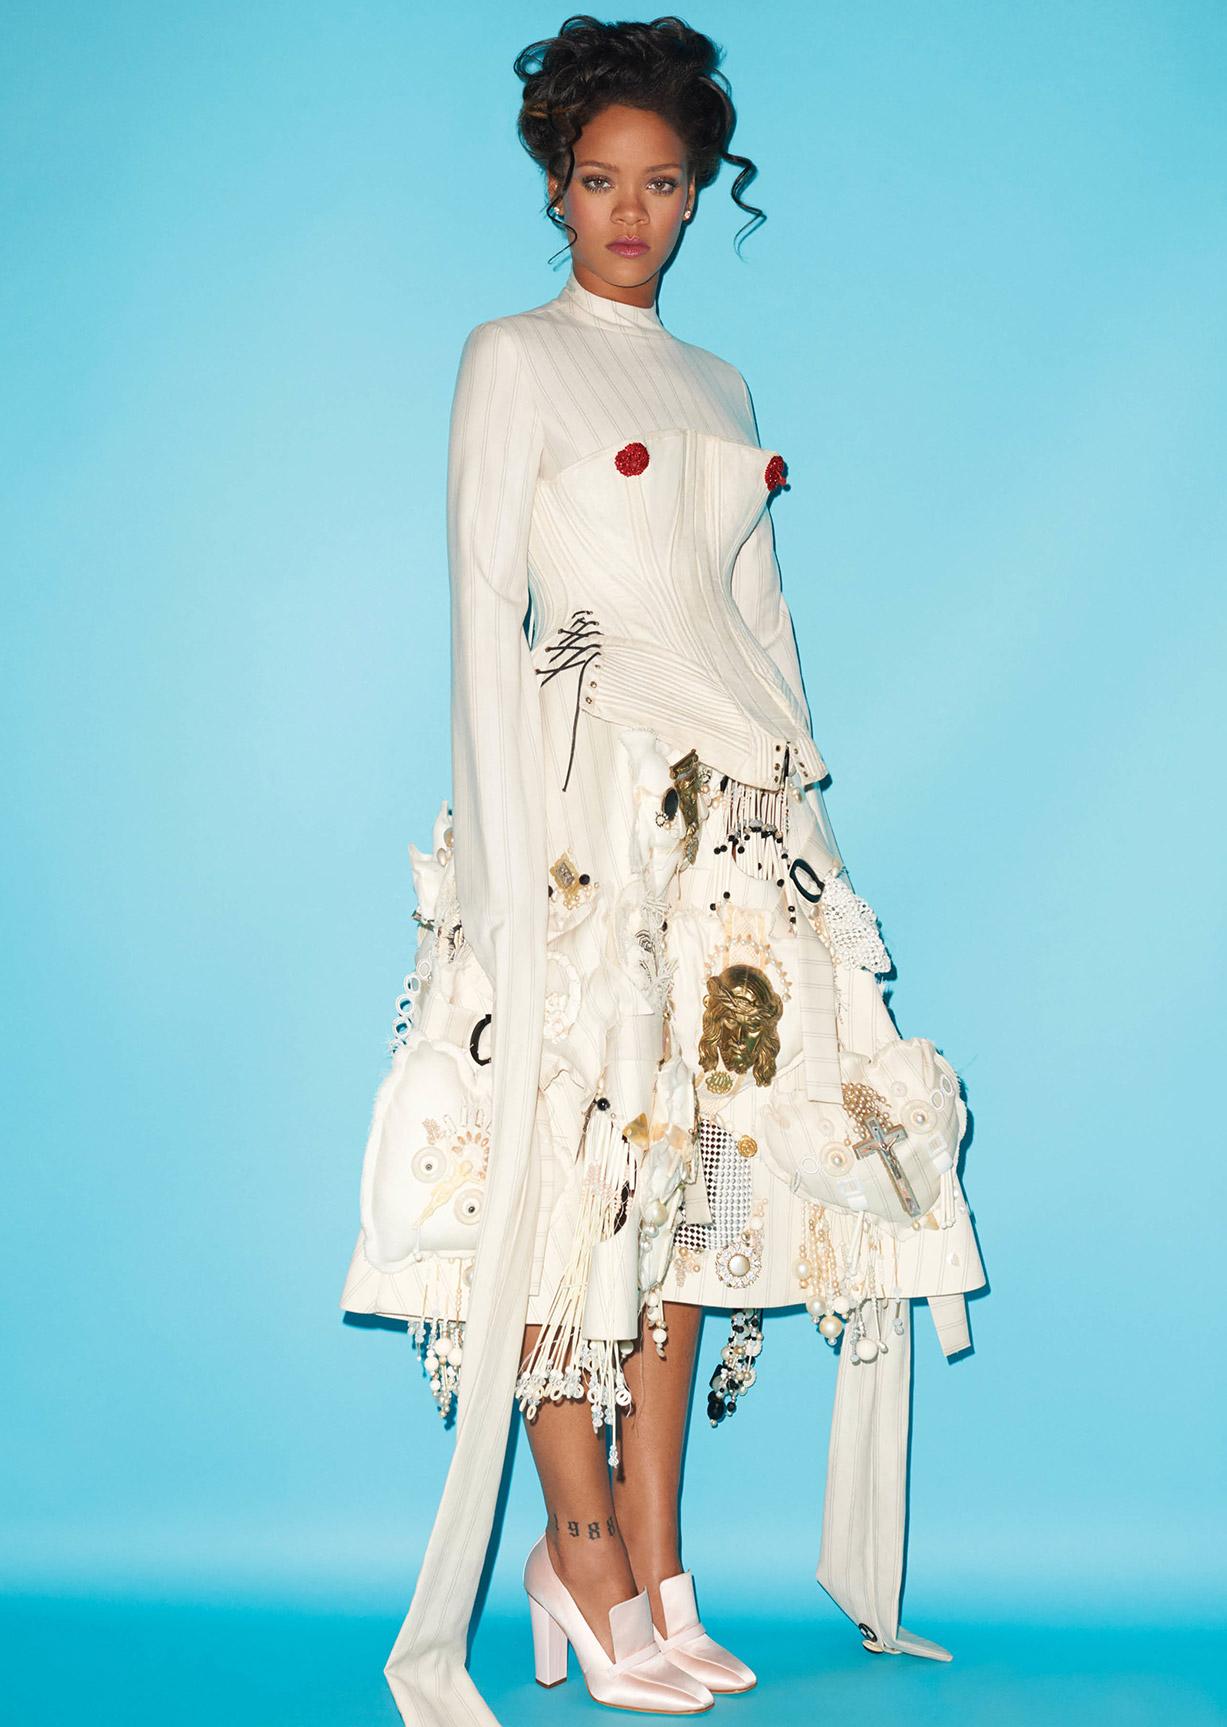 Рианна в образе Марии Антуанетты в журнале CR Fashion Book no.9 / Rihanna by Terry Richardson